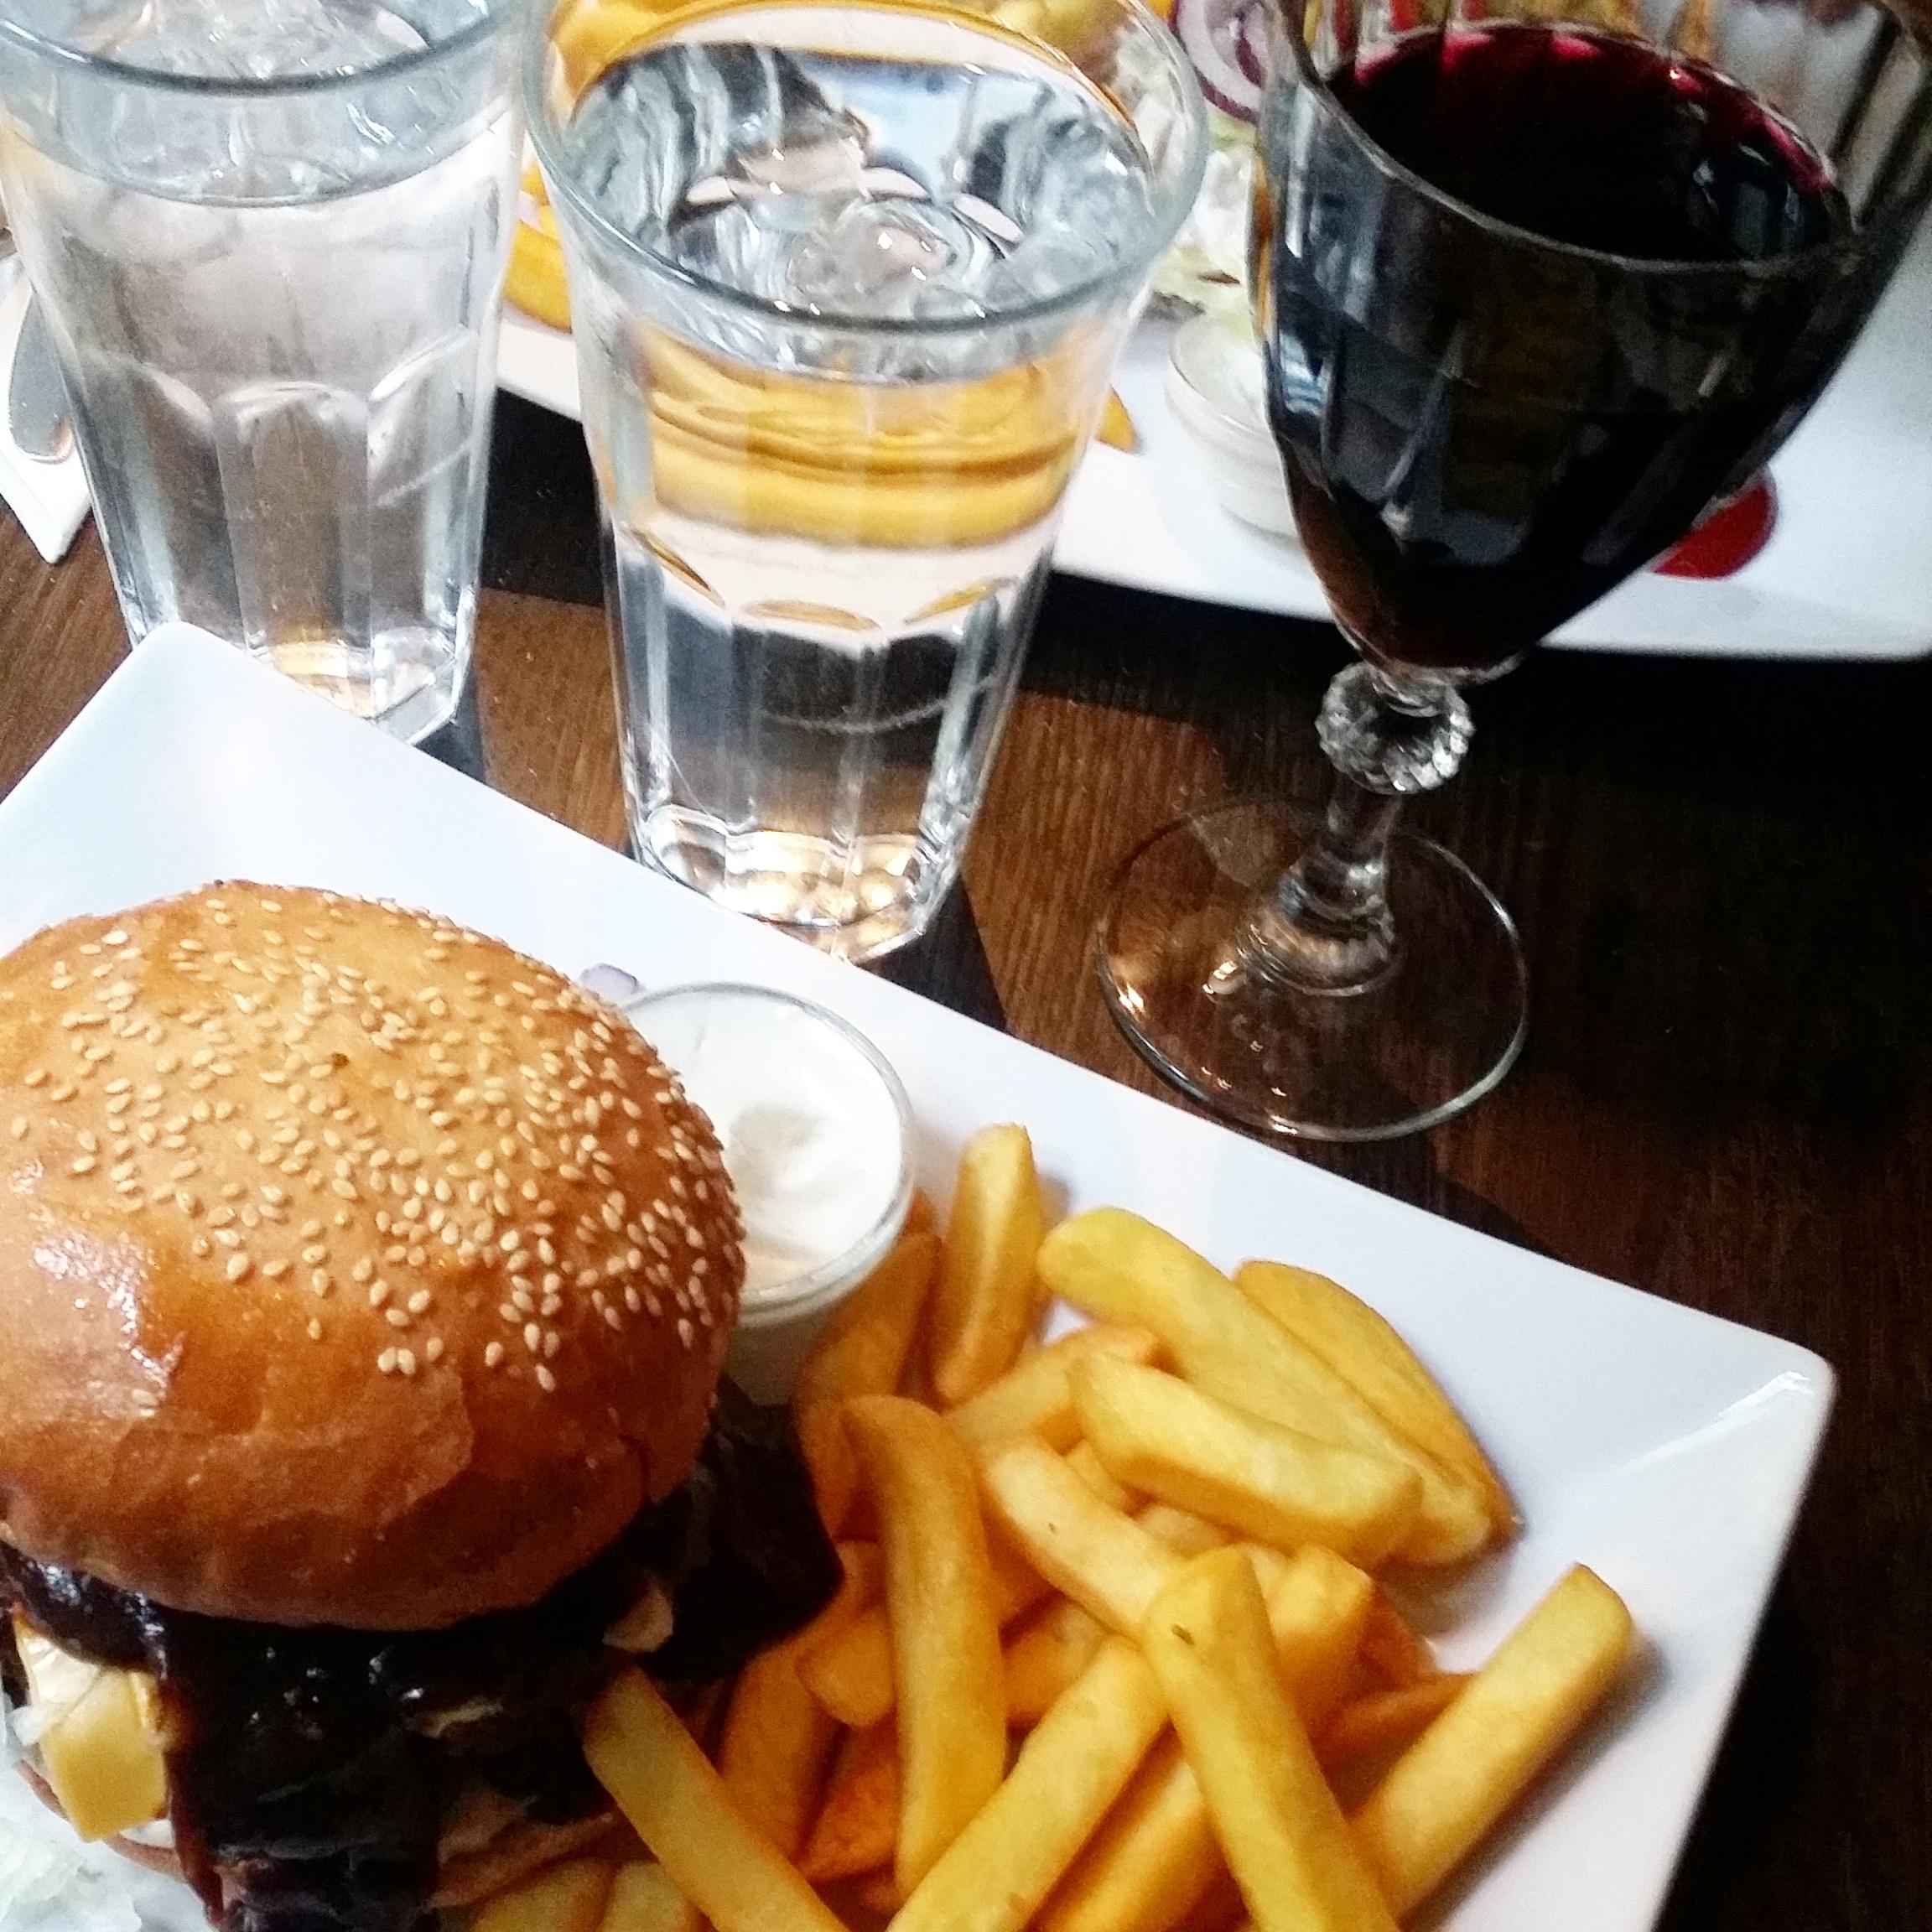 IMG 20150417 185939 Tusen & 2 Food Food Eddie Fischer Living a Style